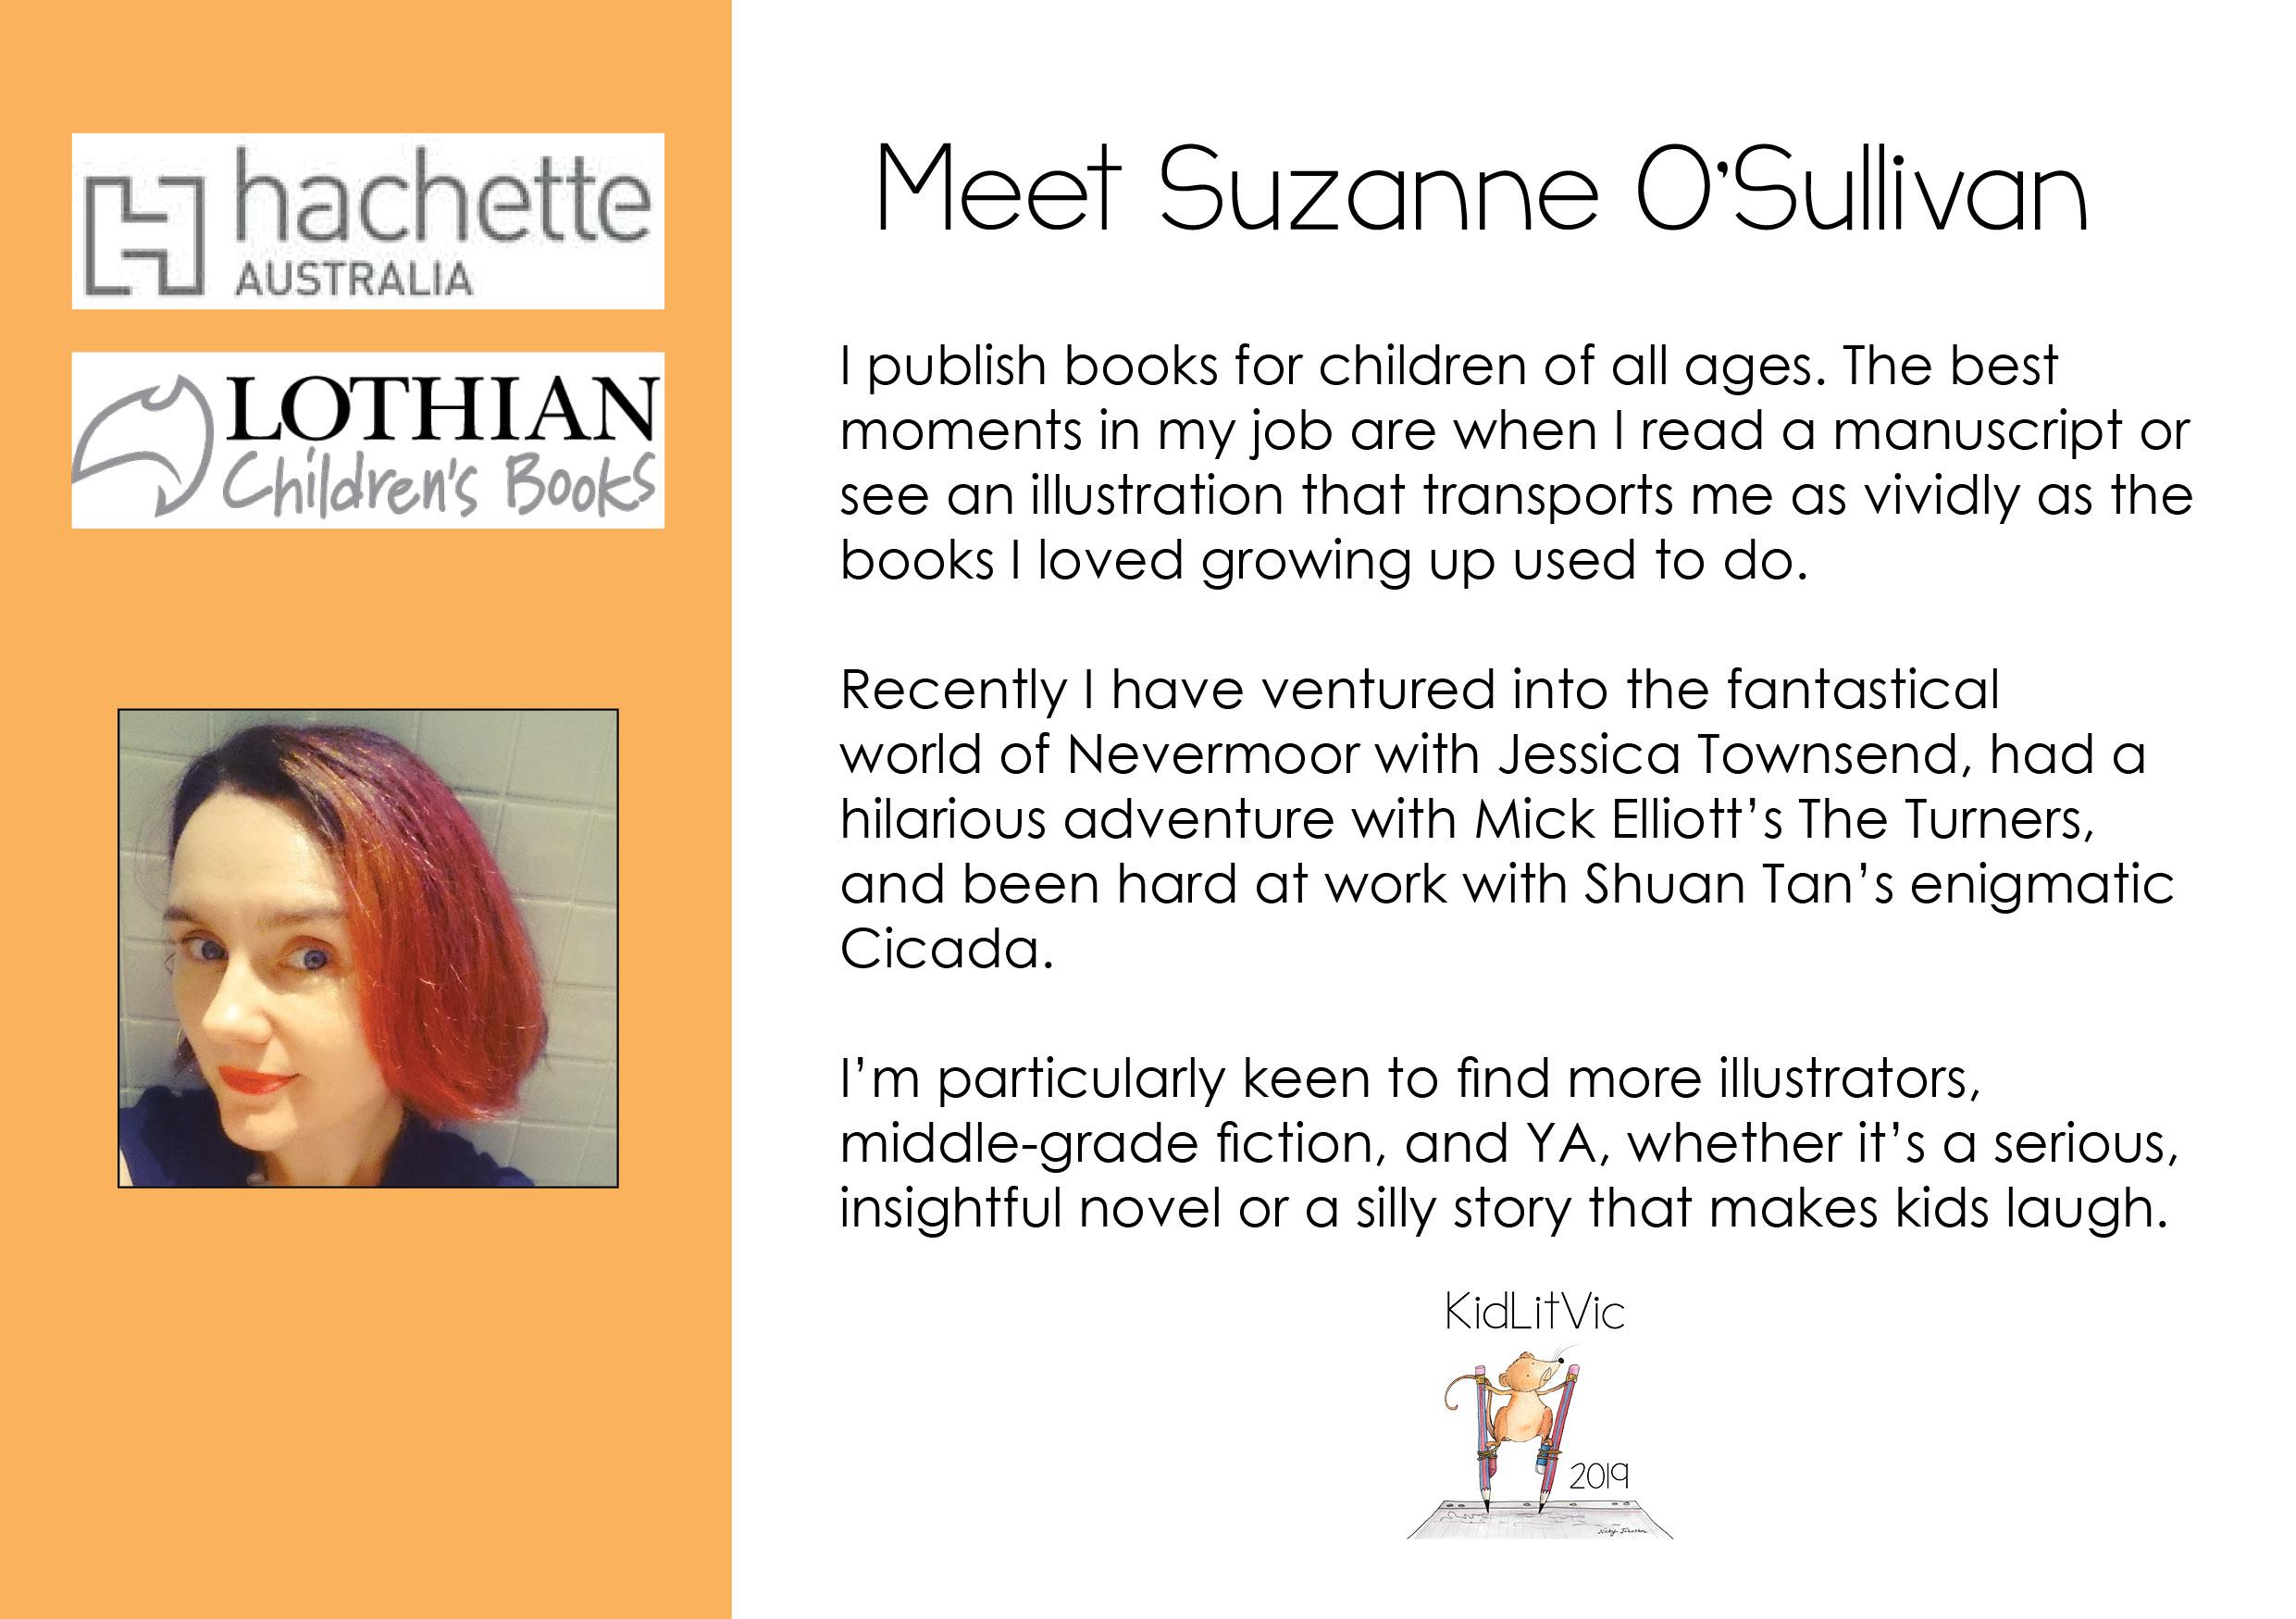 A5 - Suzanne O'Sullivan 2019.jpg